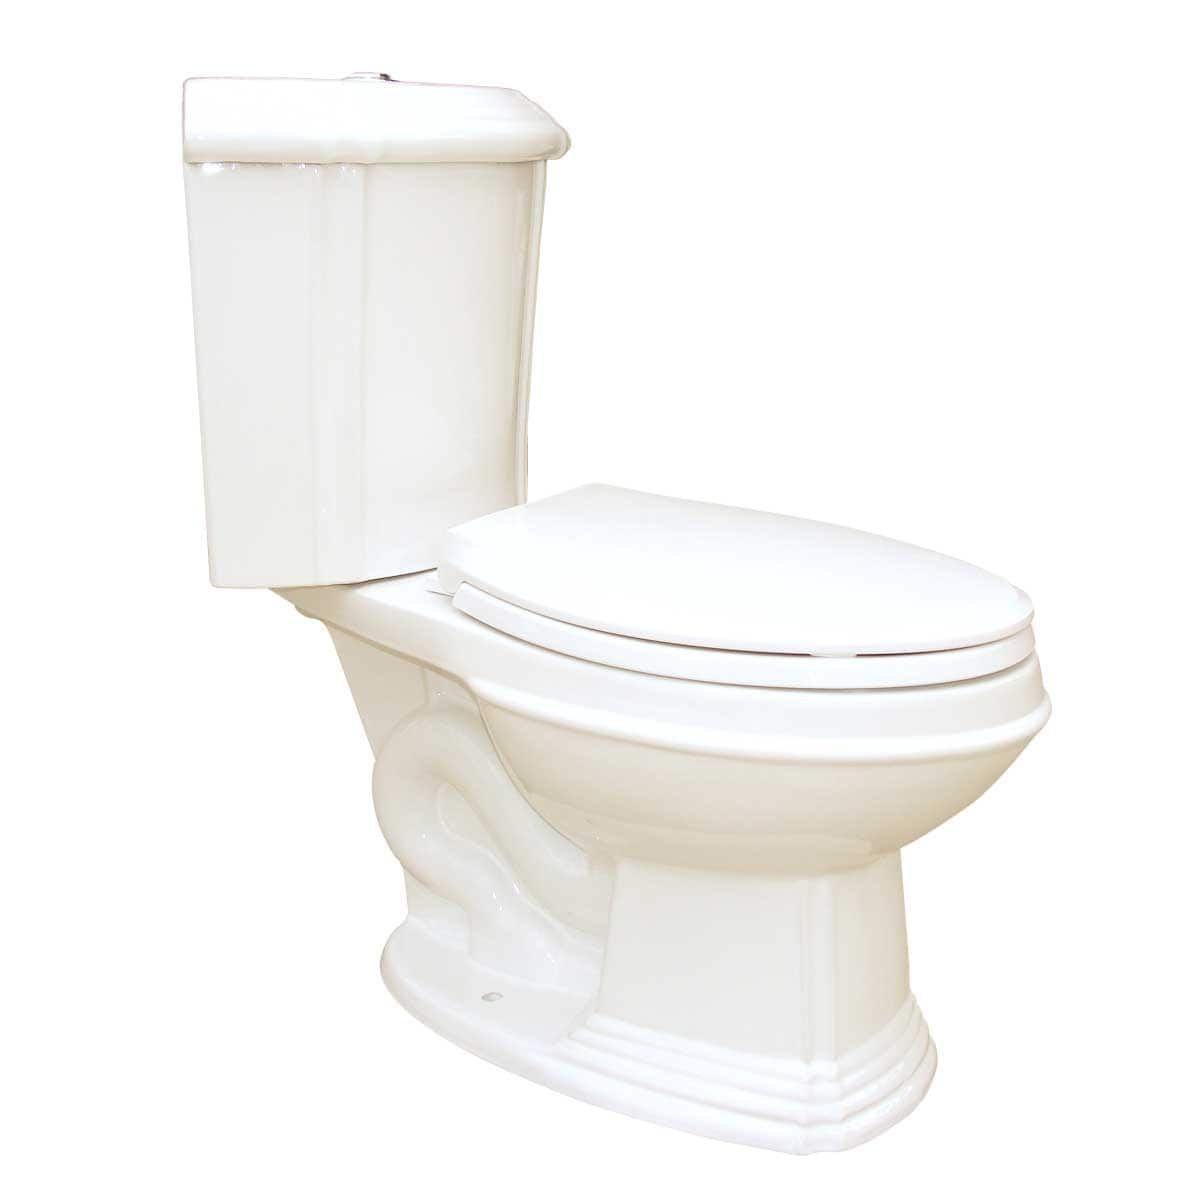 Biscuit Colored China Elongated Space Saving Corner Toilet Renovator S Supply Corner Toilet Bathroom Toilets Toilet